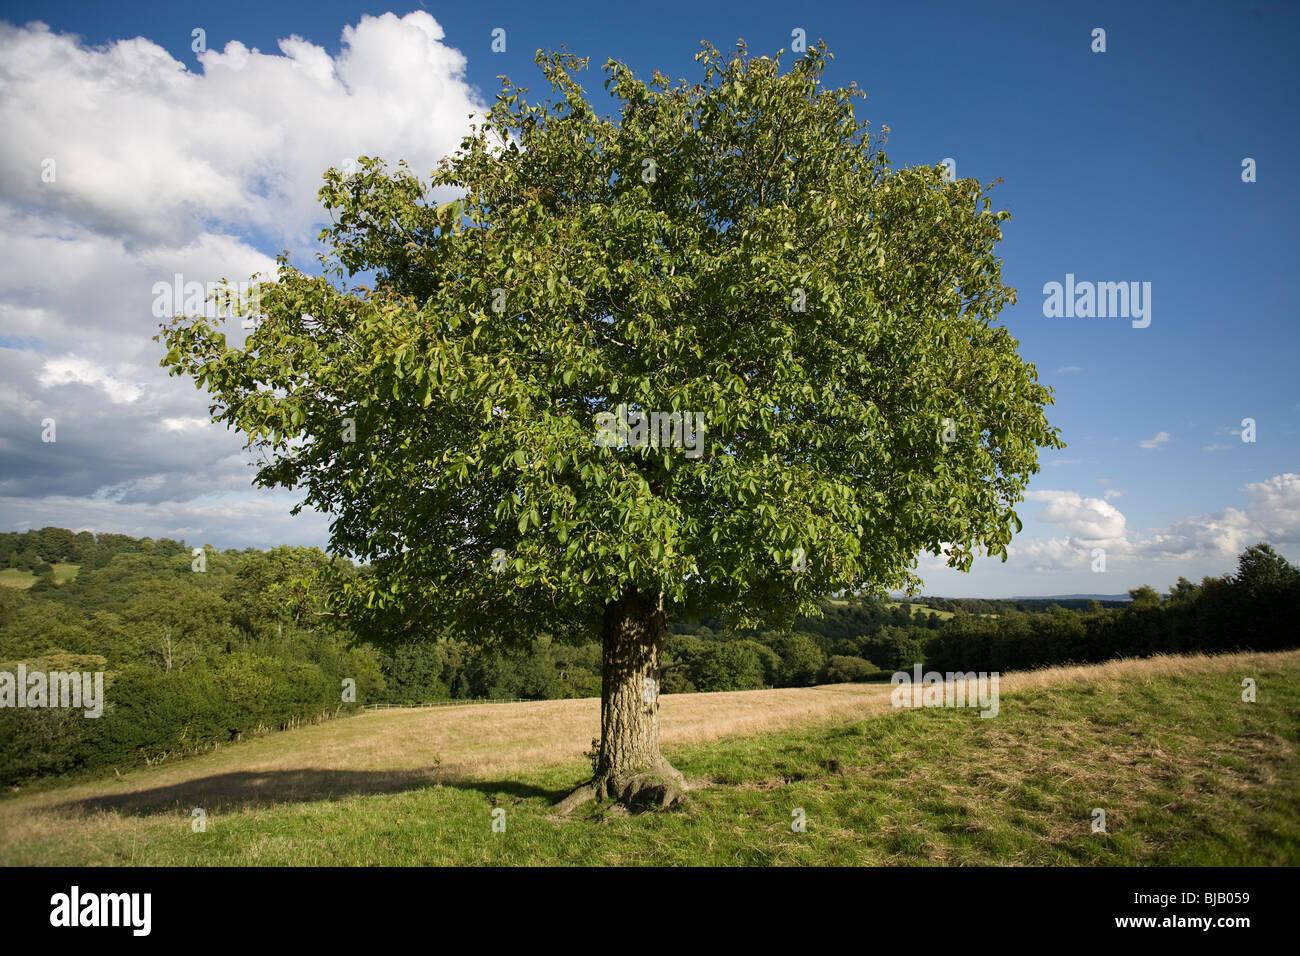 walnut tree juglans regia sussex uk stock photo royalty free image 28515797 alamy. Black Bedroom Furniture Sets. Home Design Ideas